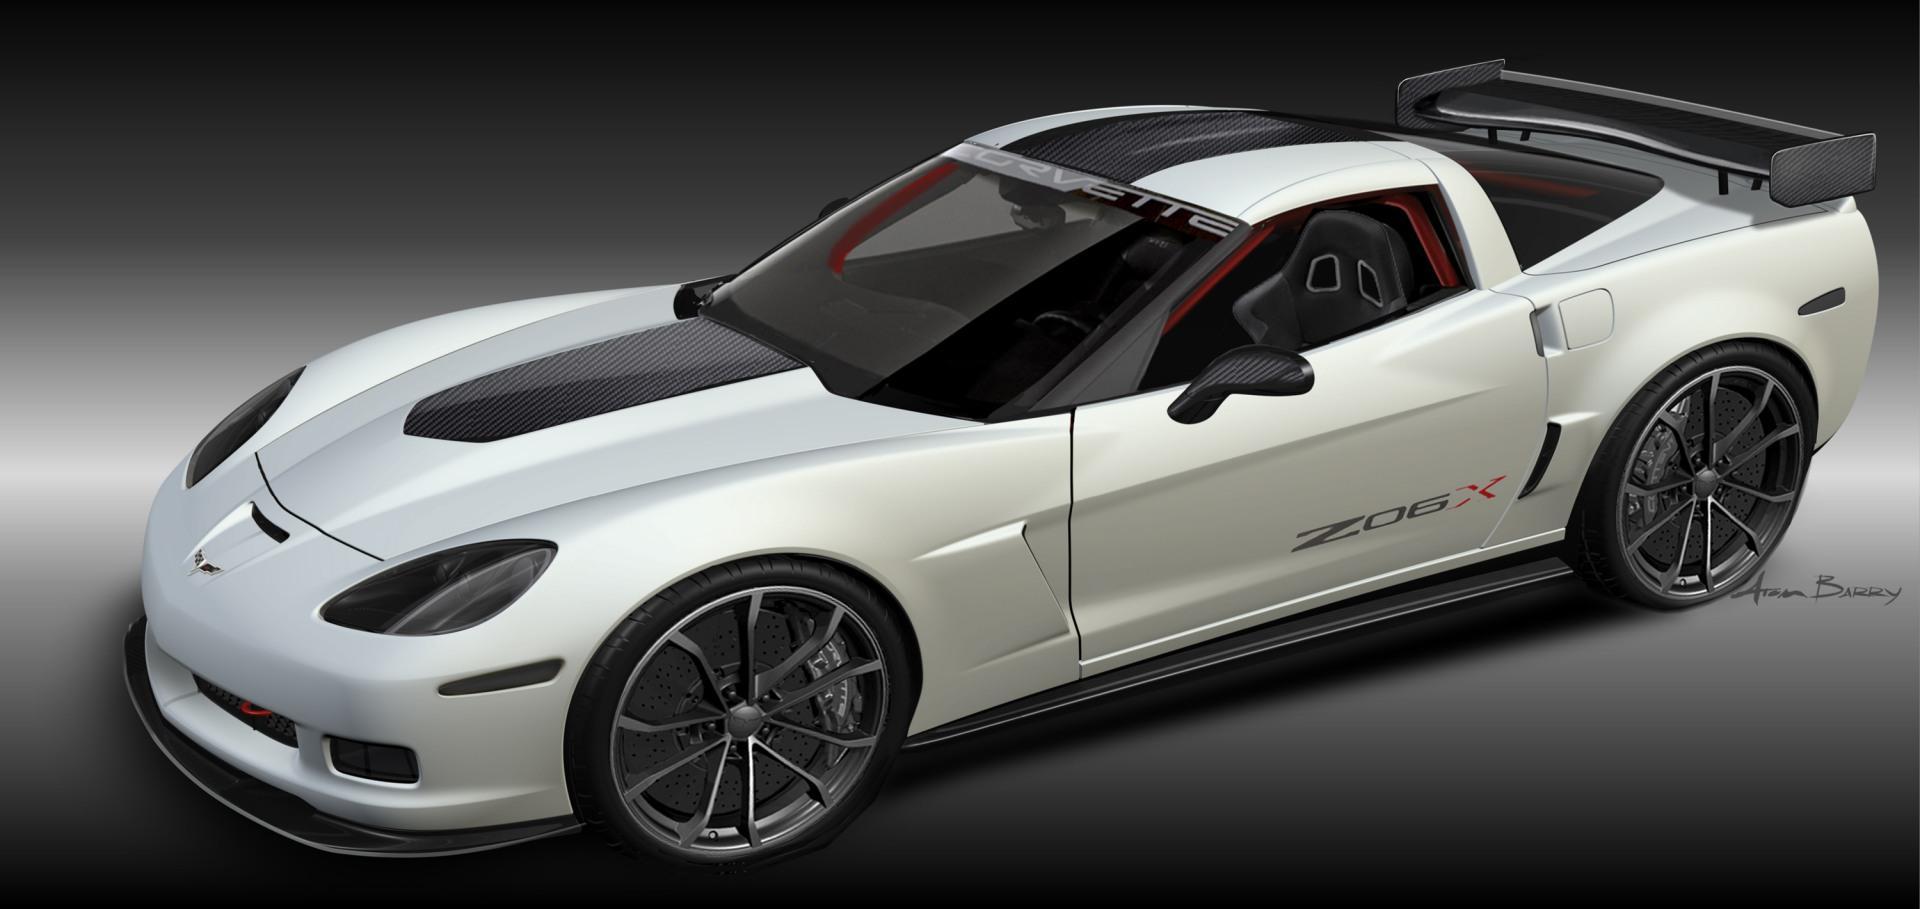 All Chevy chevy concepts : 2011 Chevrolet Corvette Z06X Track Car Concept - conceptcarz.com